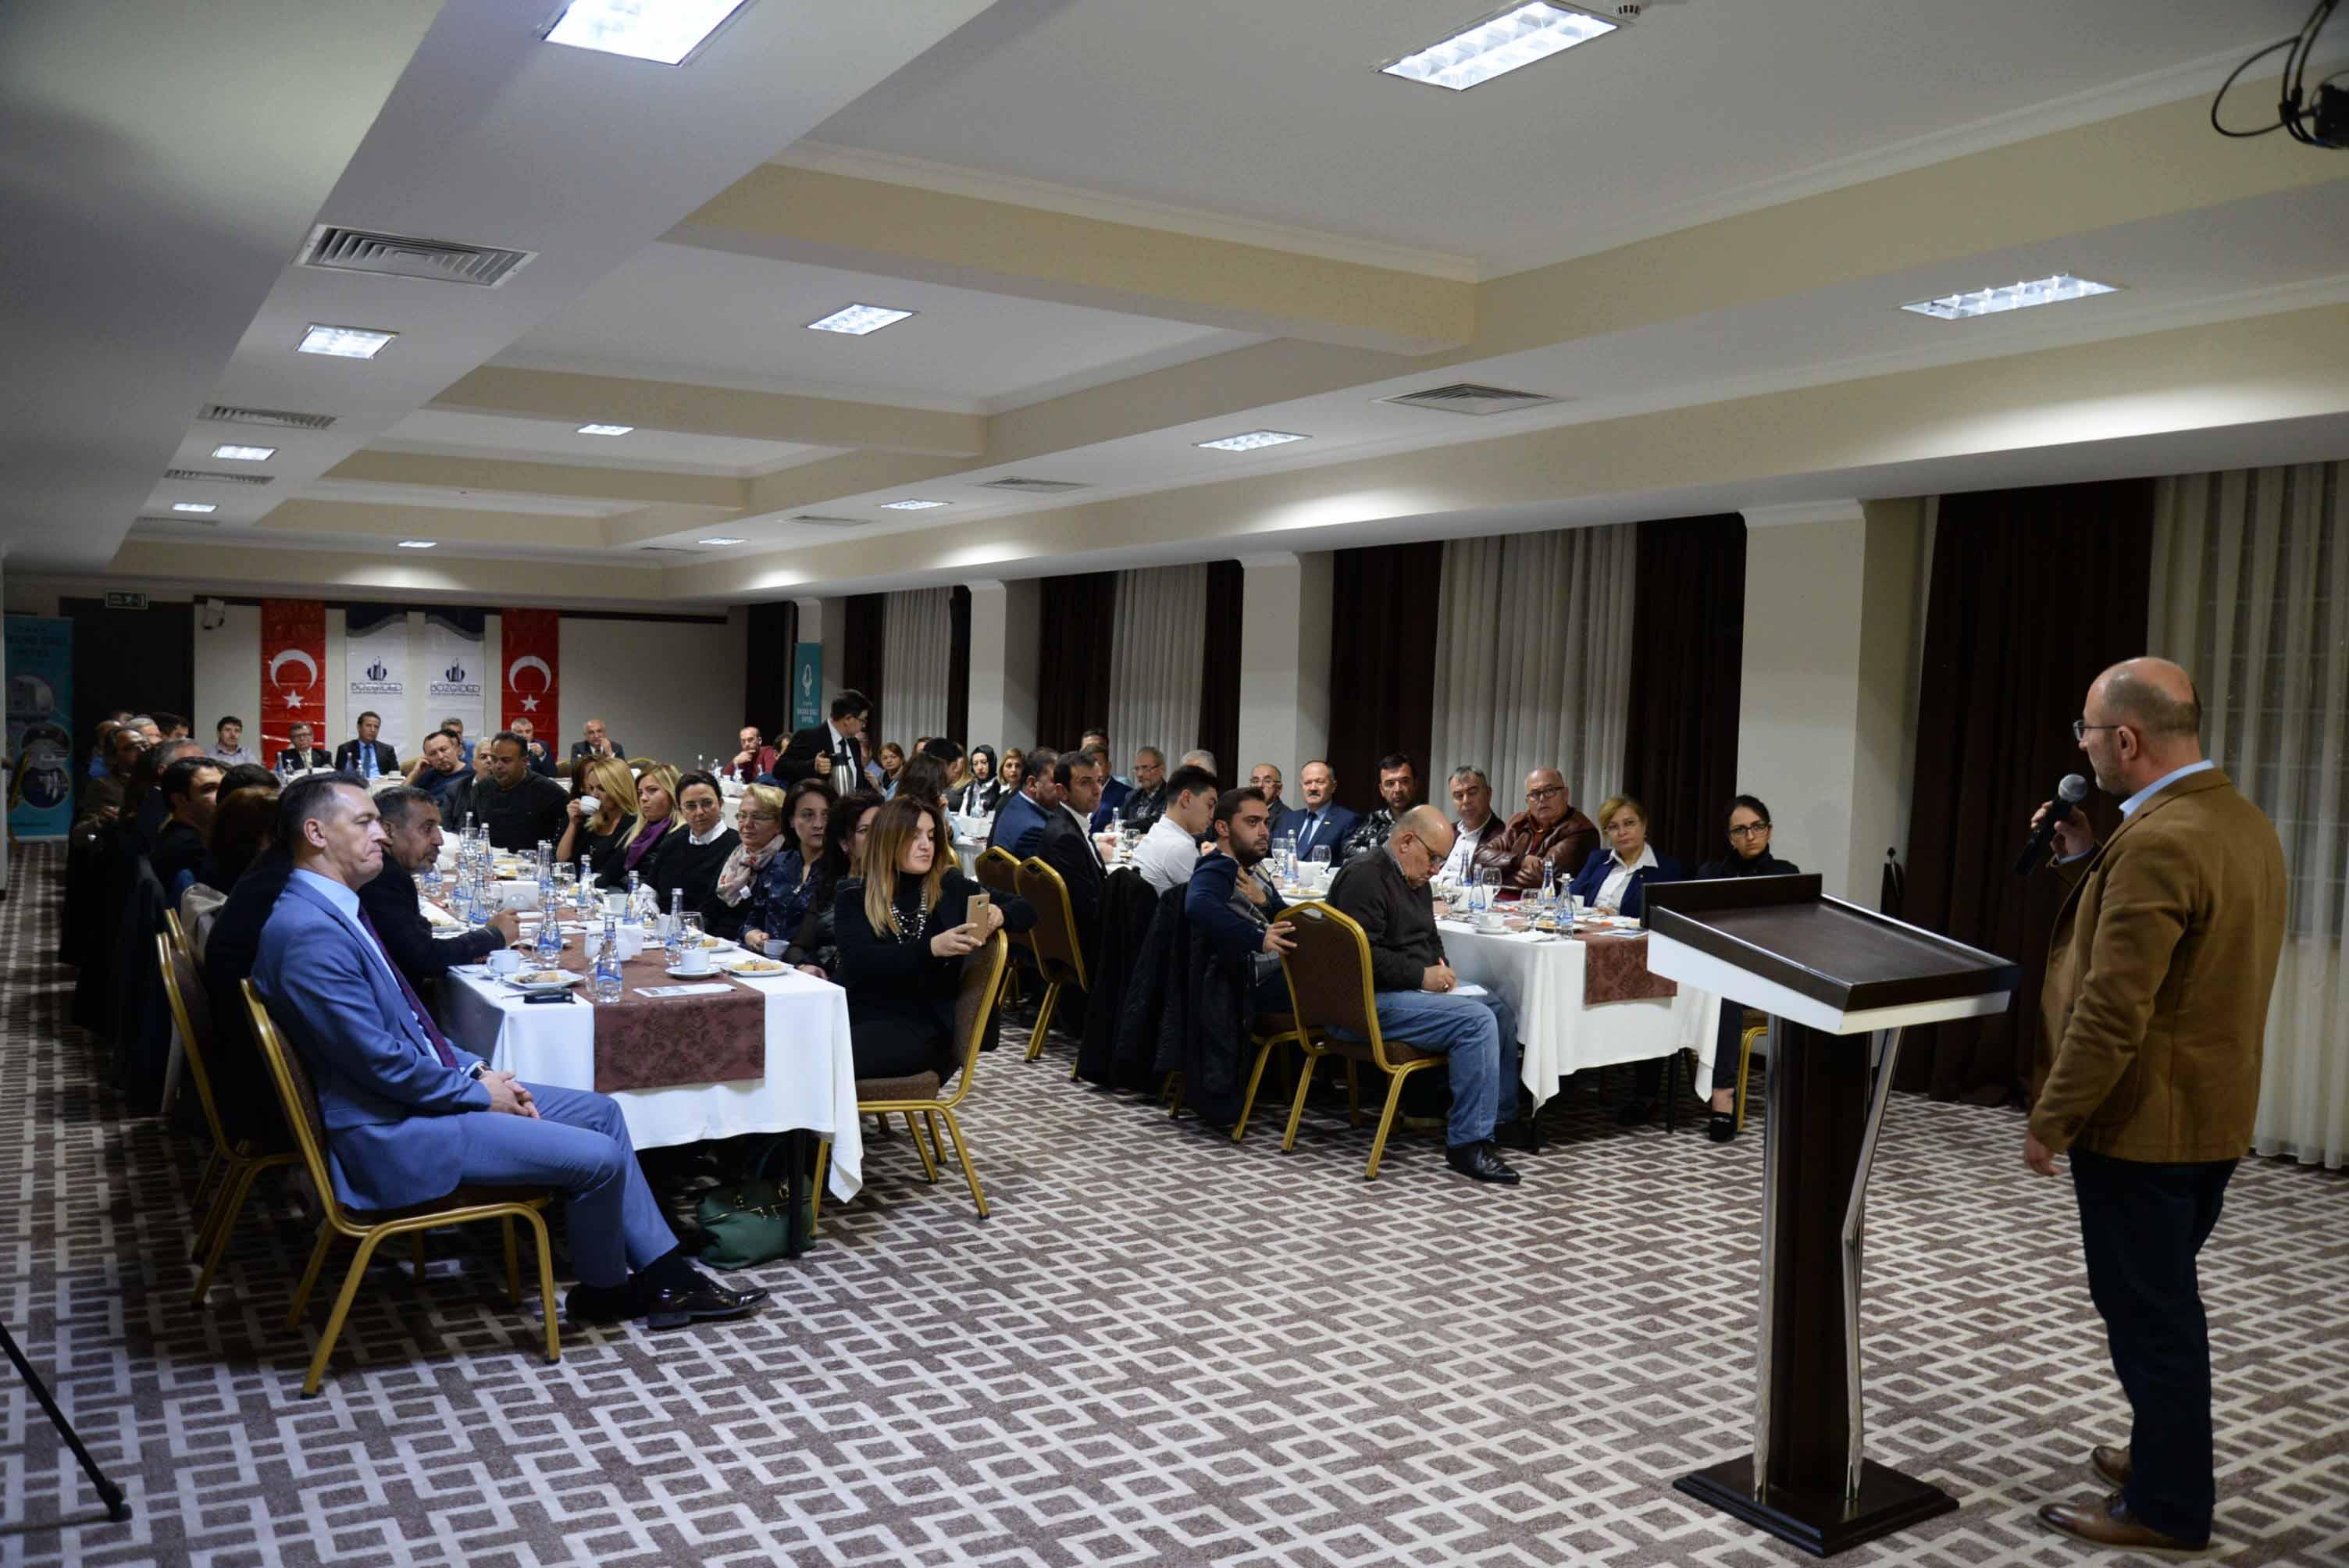 bsk--yrd-nazmi-kuru-girisimcilik-konferansi-6-(2).jpg